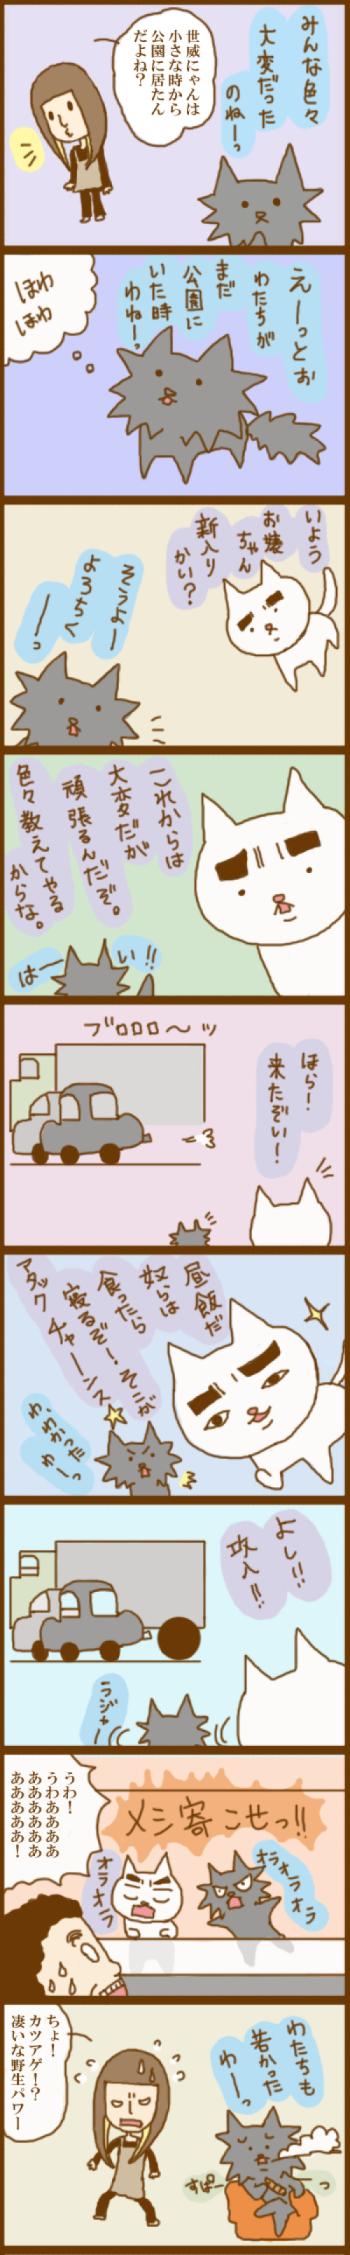 f:id:suzuokayu:20201116112041j:plain